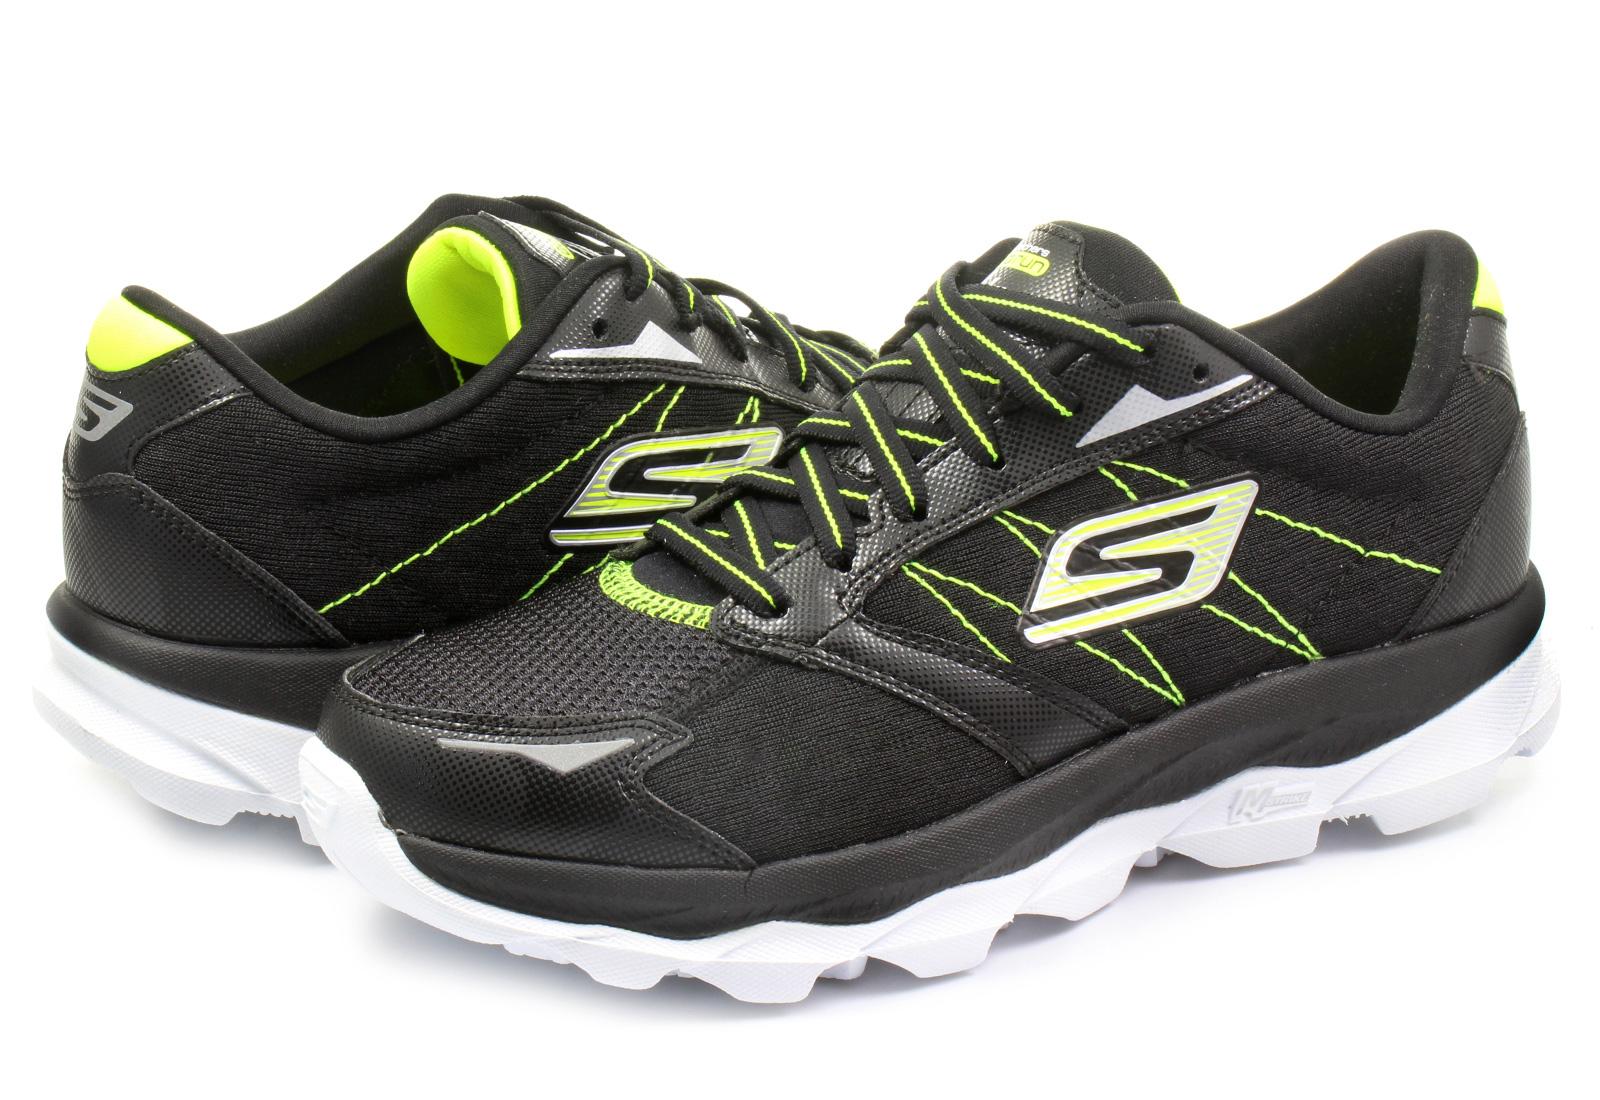 New Women's Skechers GO RUN ULTRA 13915 Running Shoes Size 7(US)